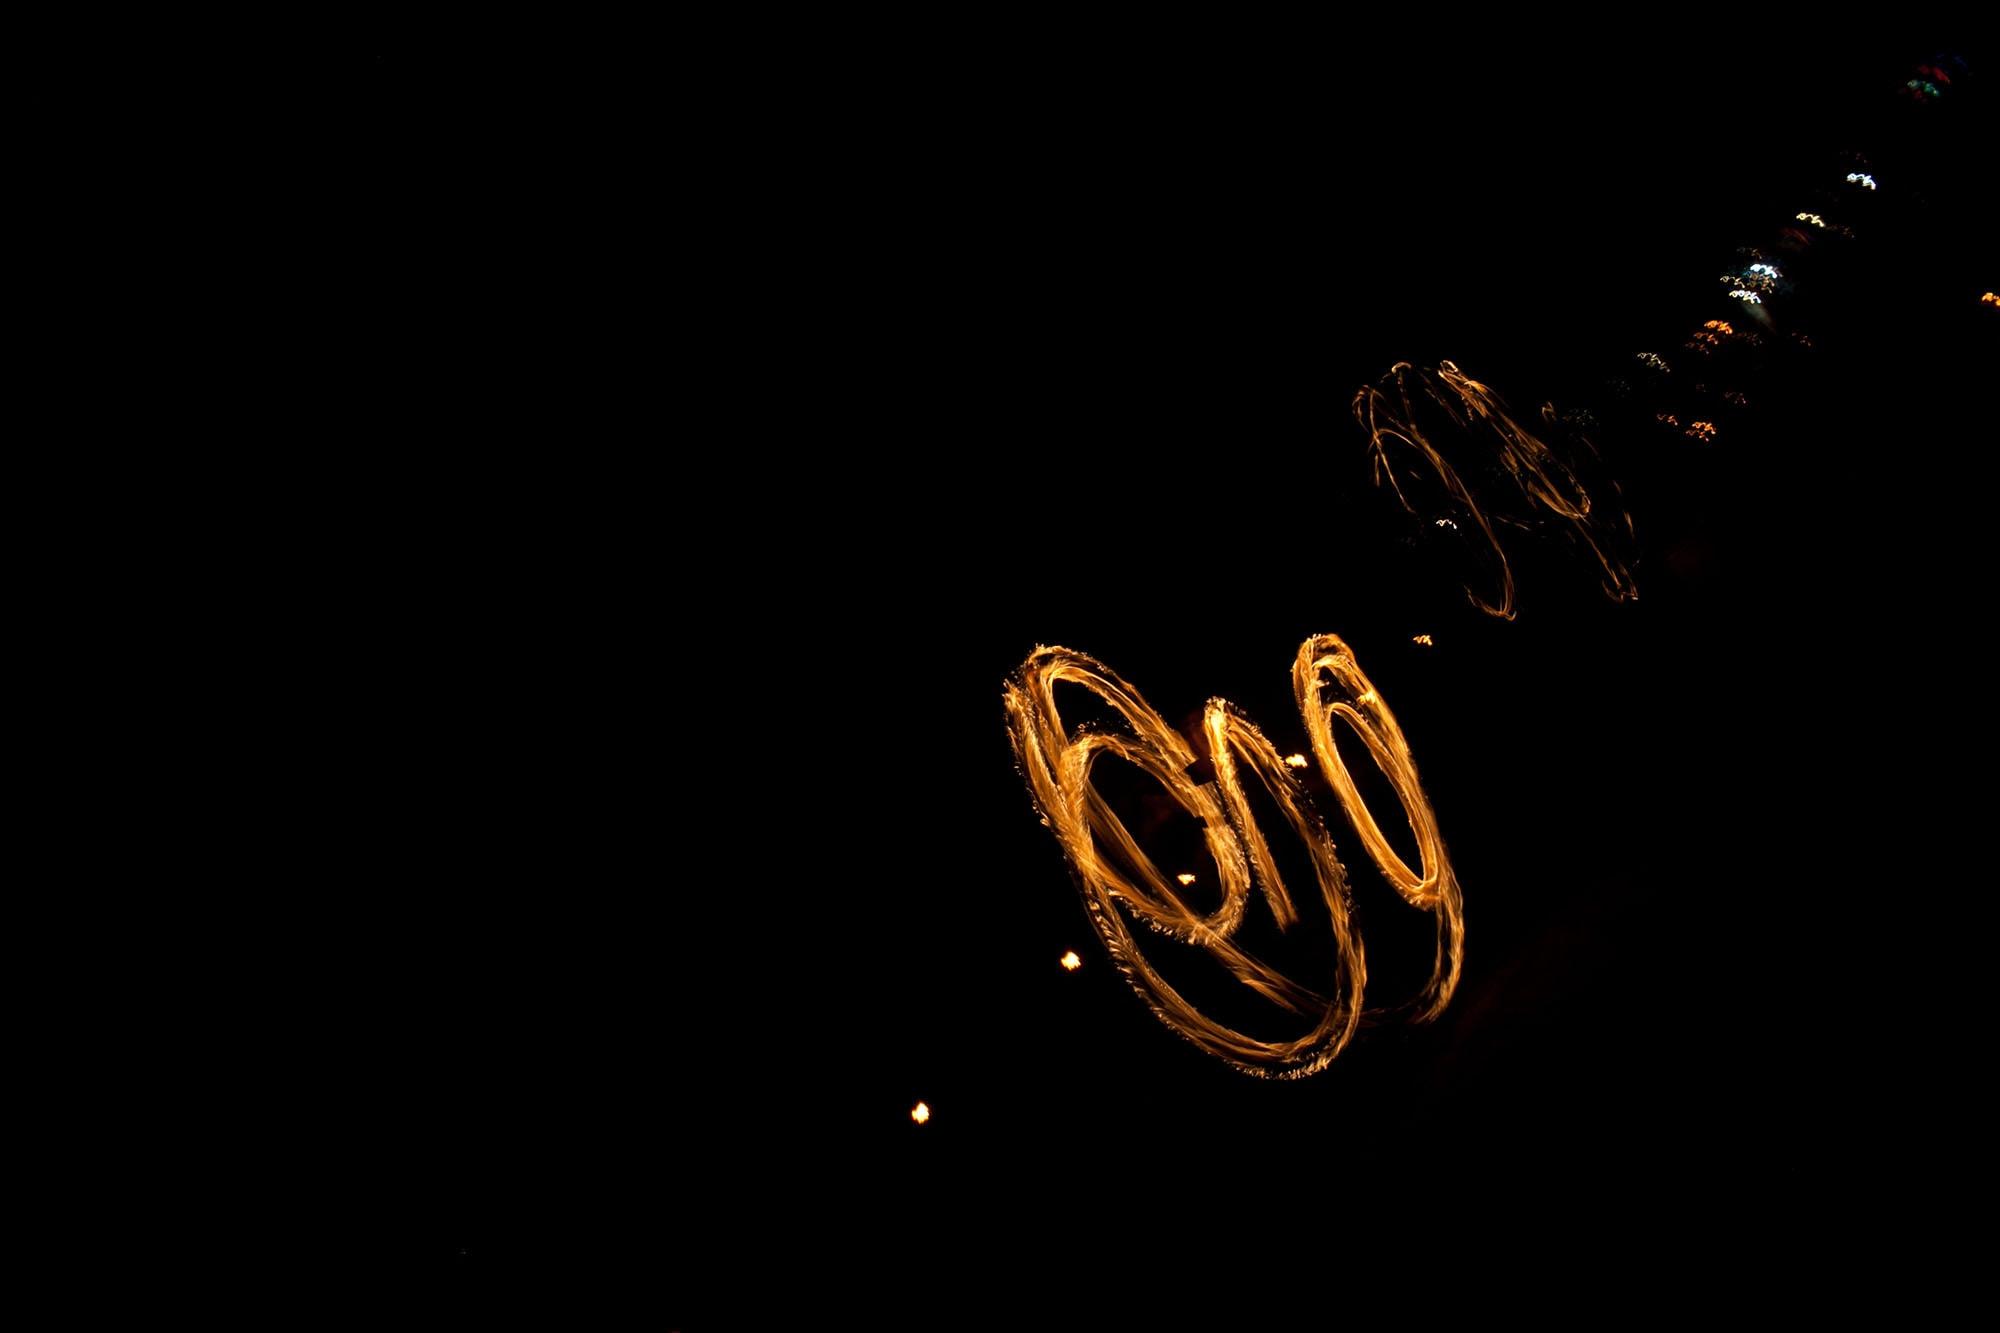 Poi fire dancers in Koh Tao, Thailand.